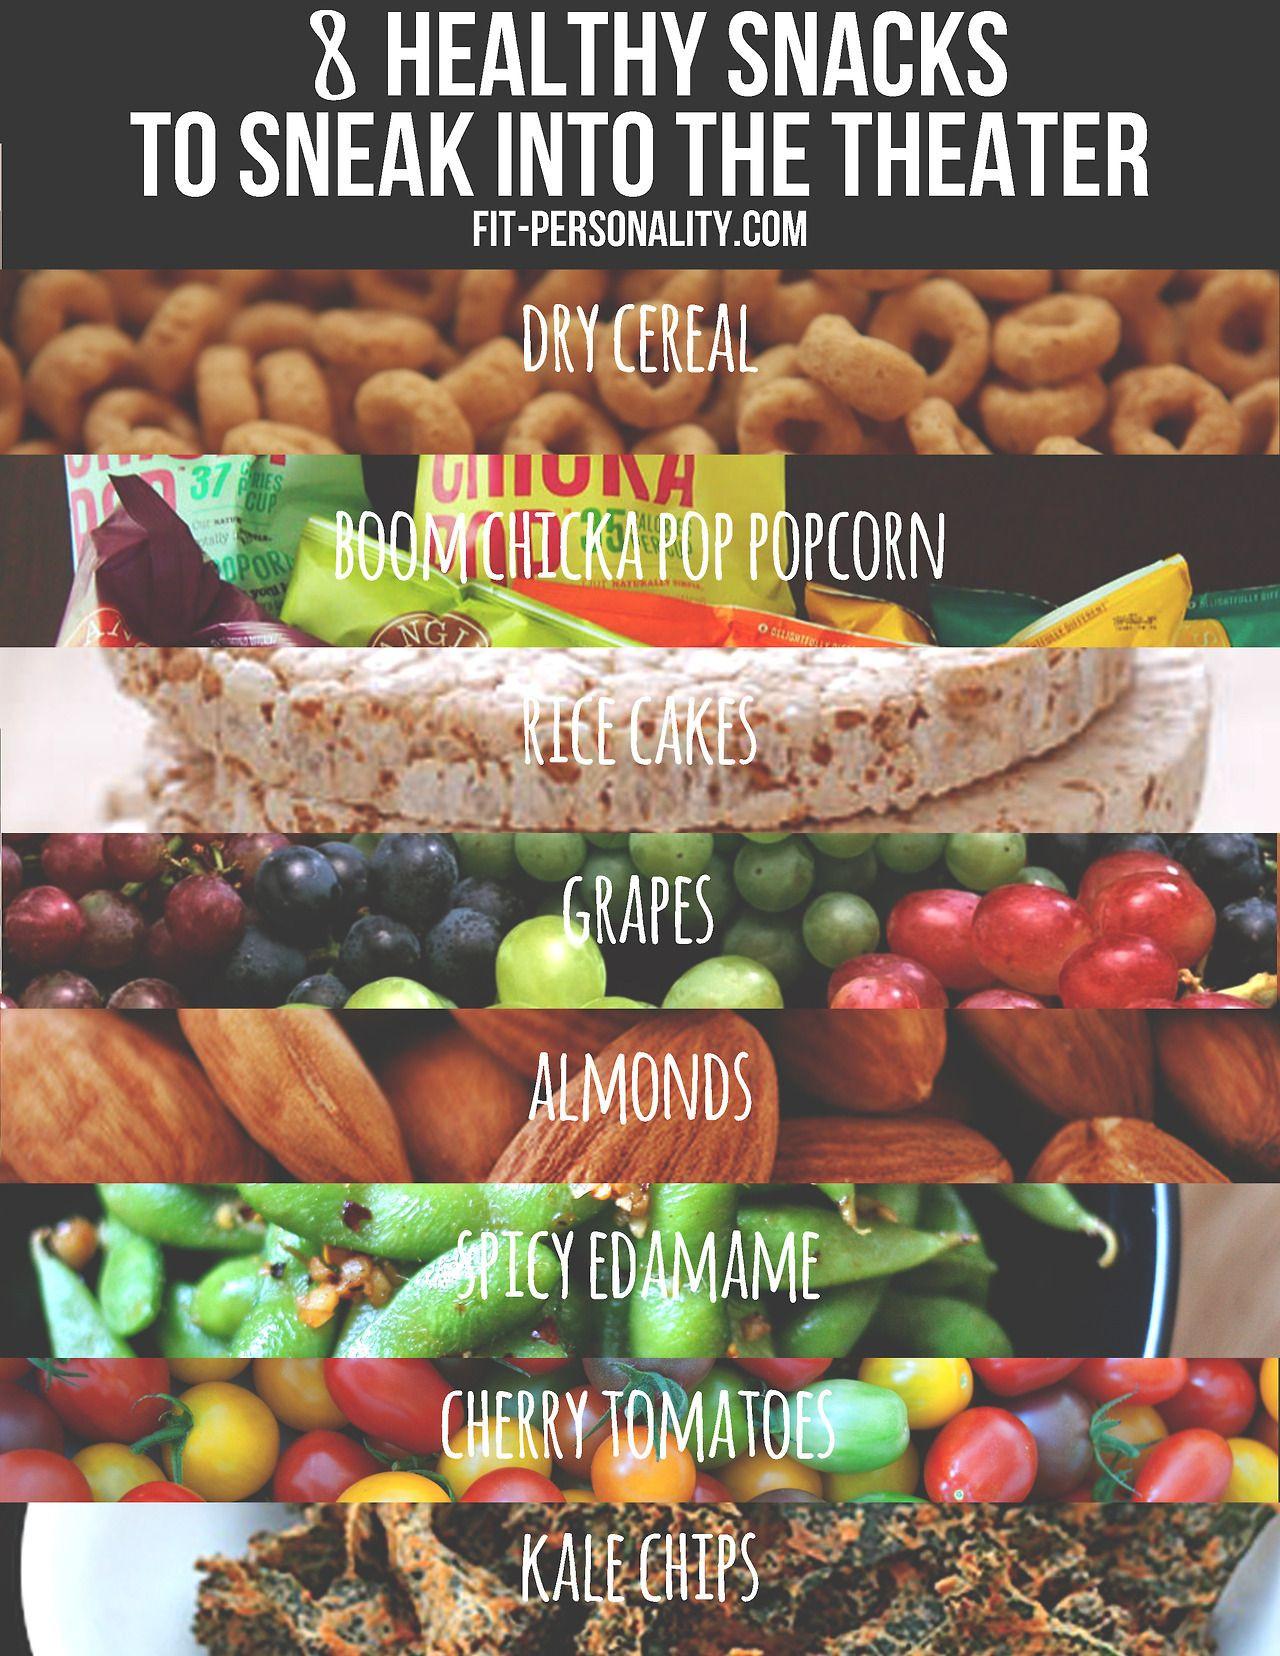 Healthy Movie Snacks to Sneak In 20 Best Ideas 8 Healthy Snacks to Sneak Into the